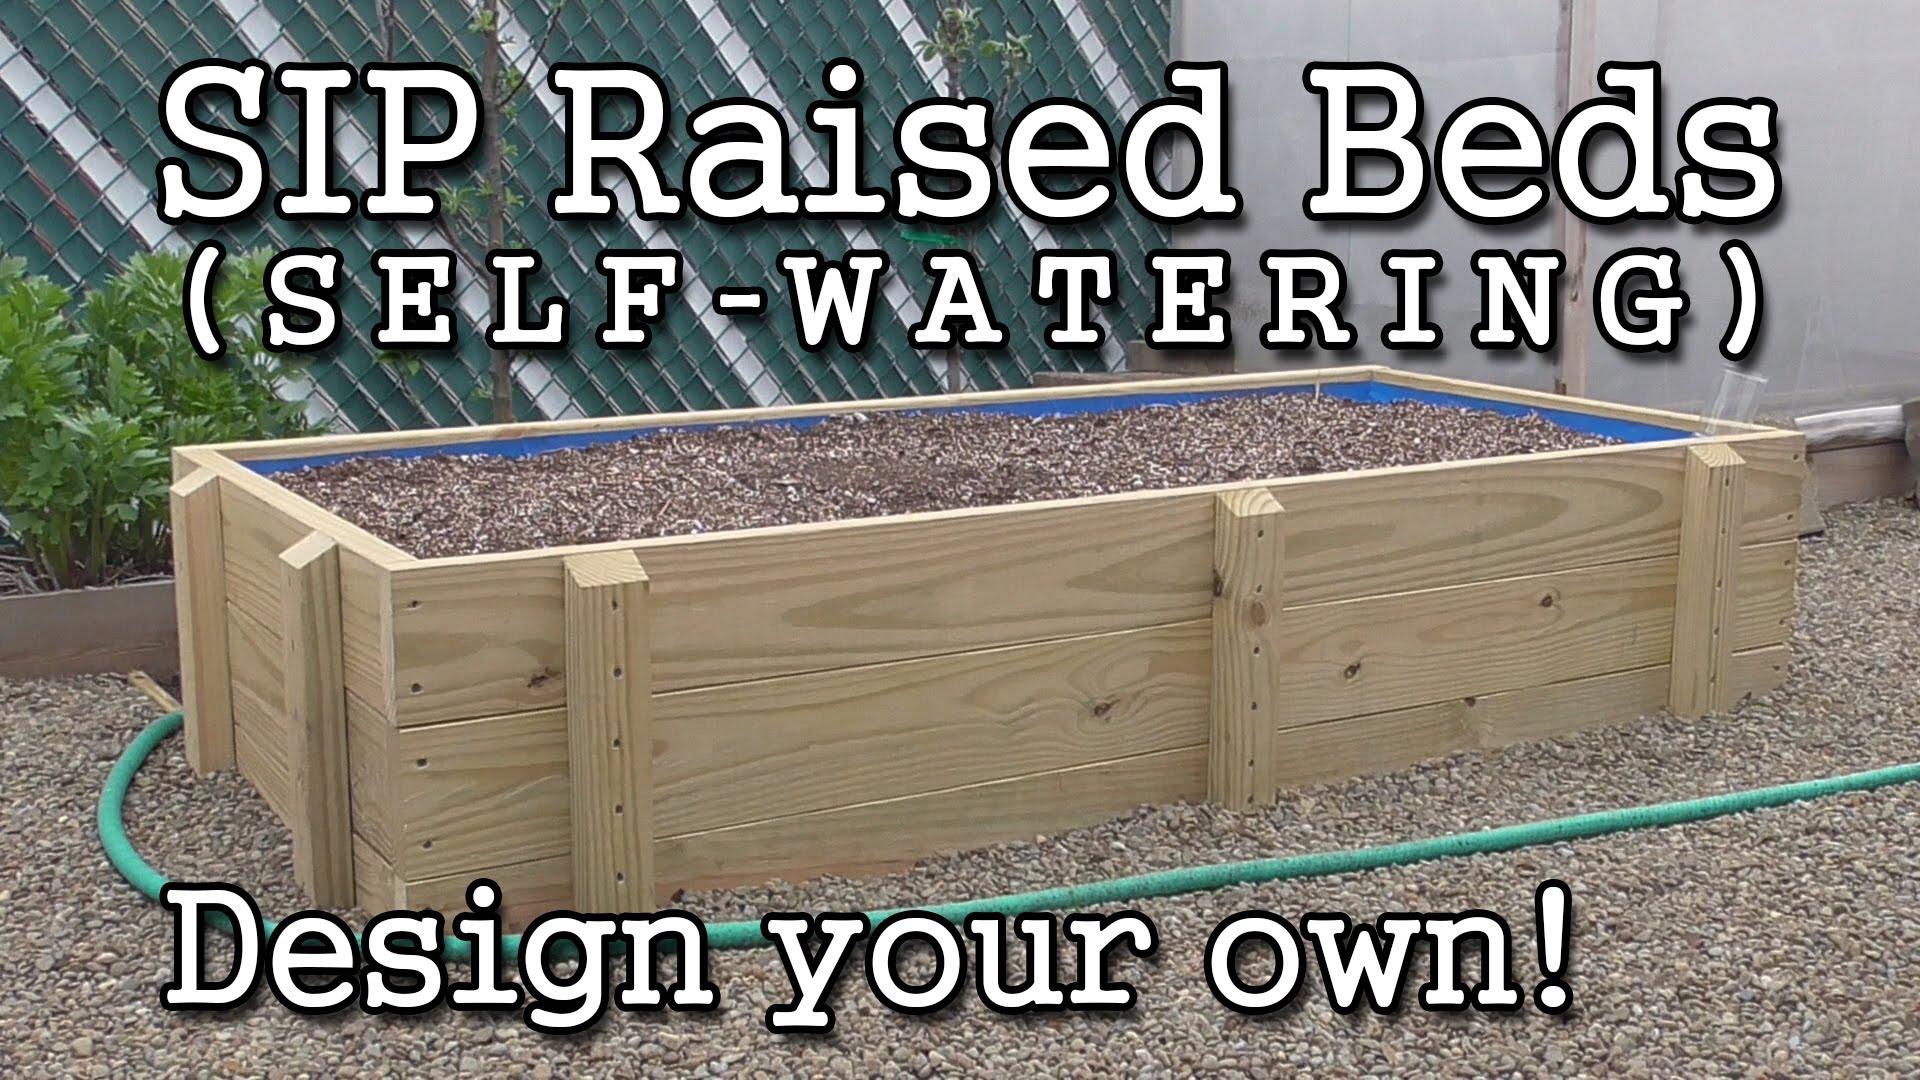 Self Watering Raised Garden Bed Plans